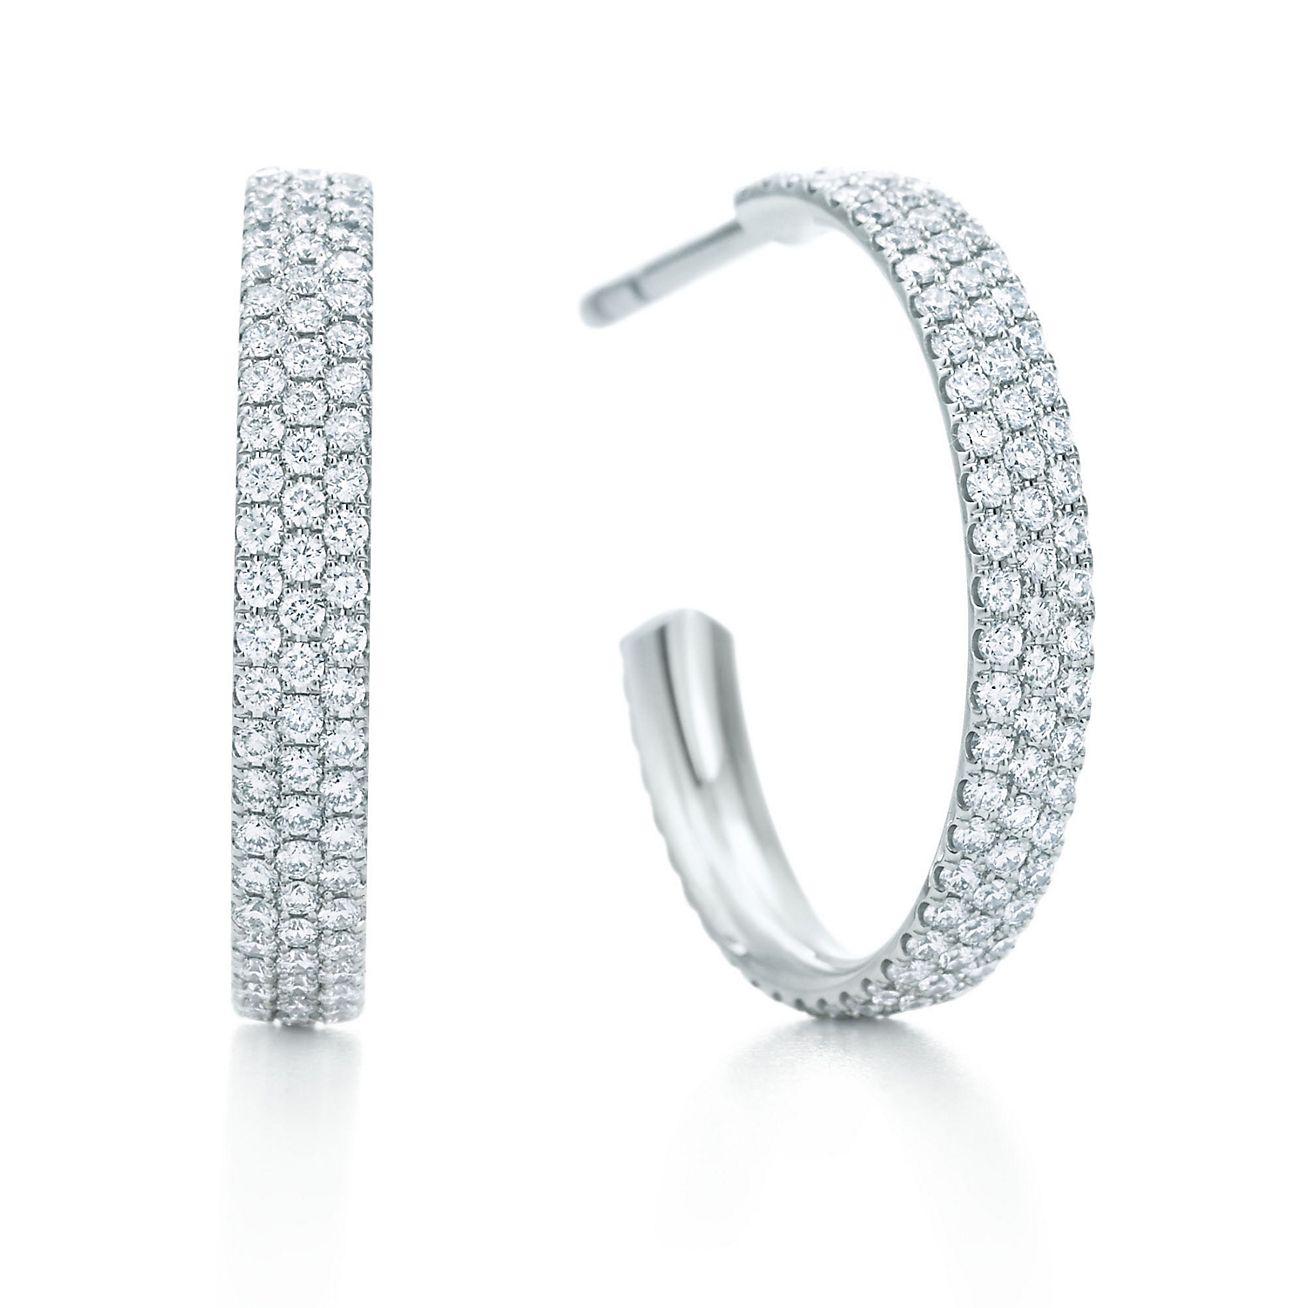 Tiffany Metro threerow hoop earrings in 18k white gold with